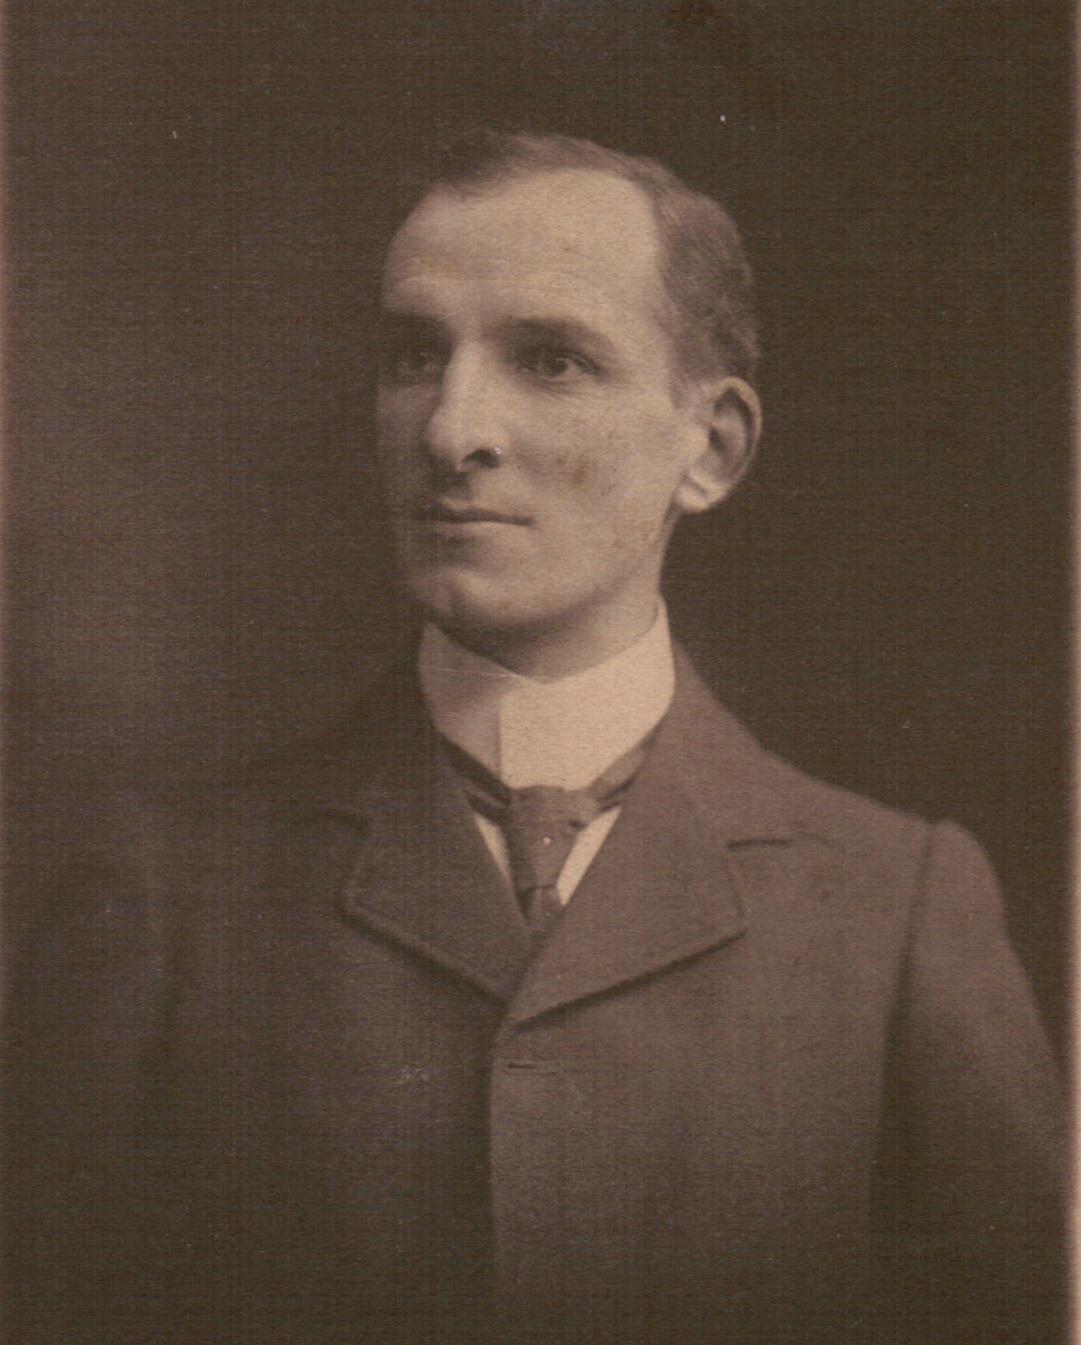 My maternal Grandfather, Jimmy